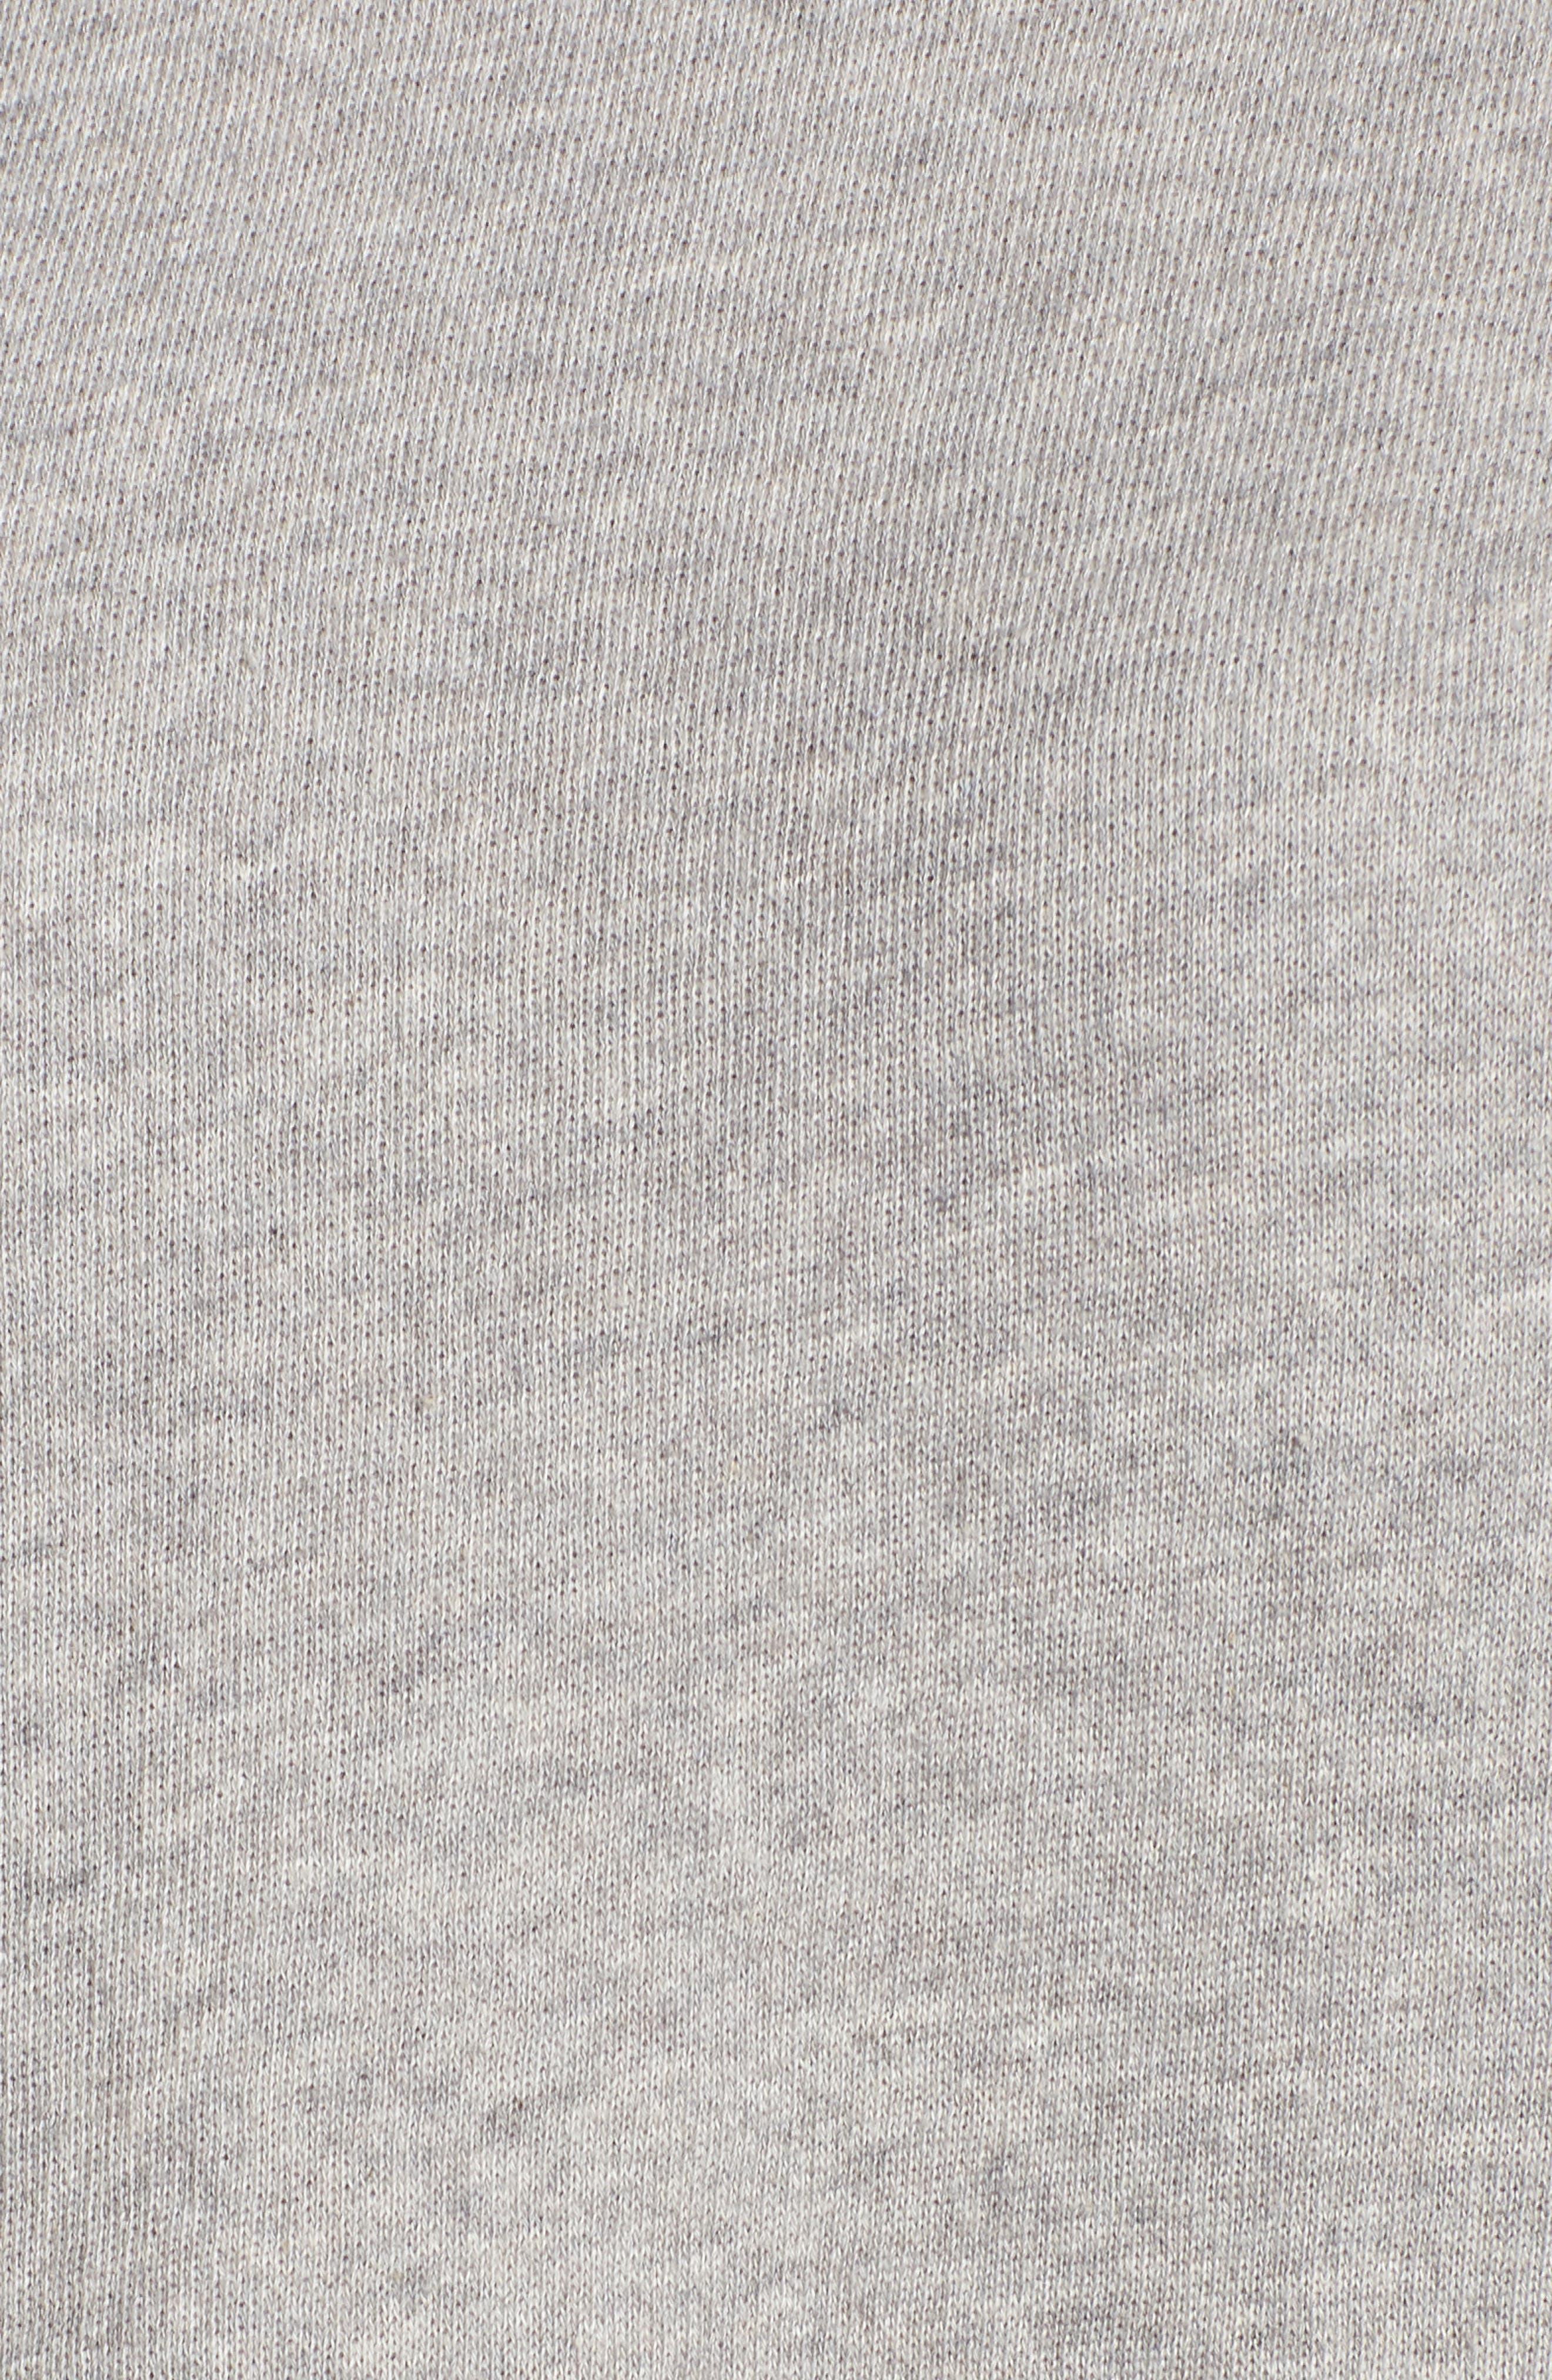 Twofer Sweatshirt,                             Alternate thumbnail 5, color,                             050